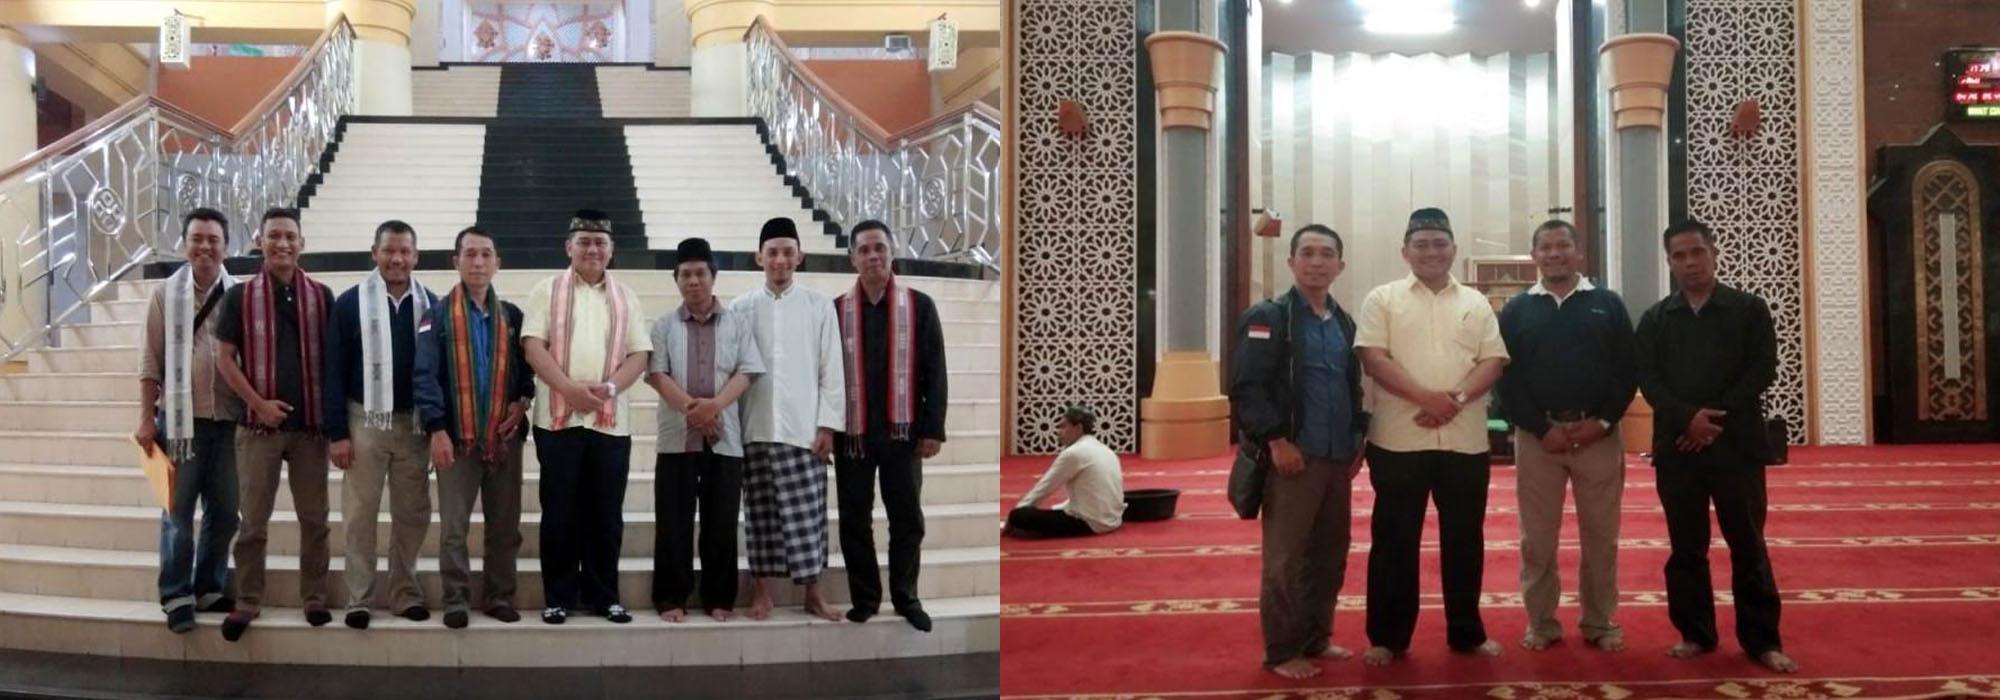 Studi Tiru Ke MasjidHubbul Wathan Islamic Center Di Mataram